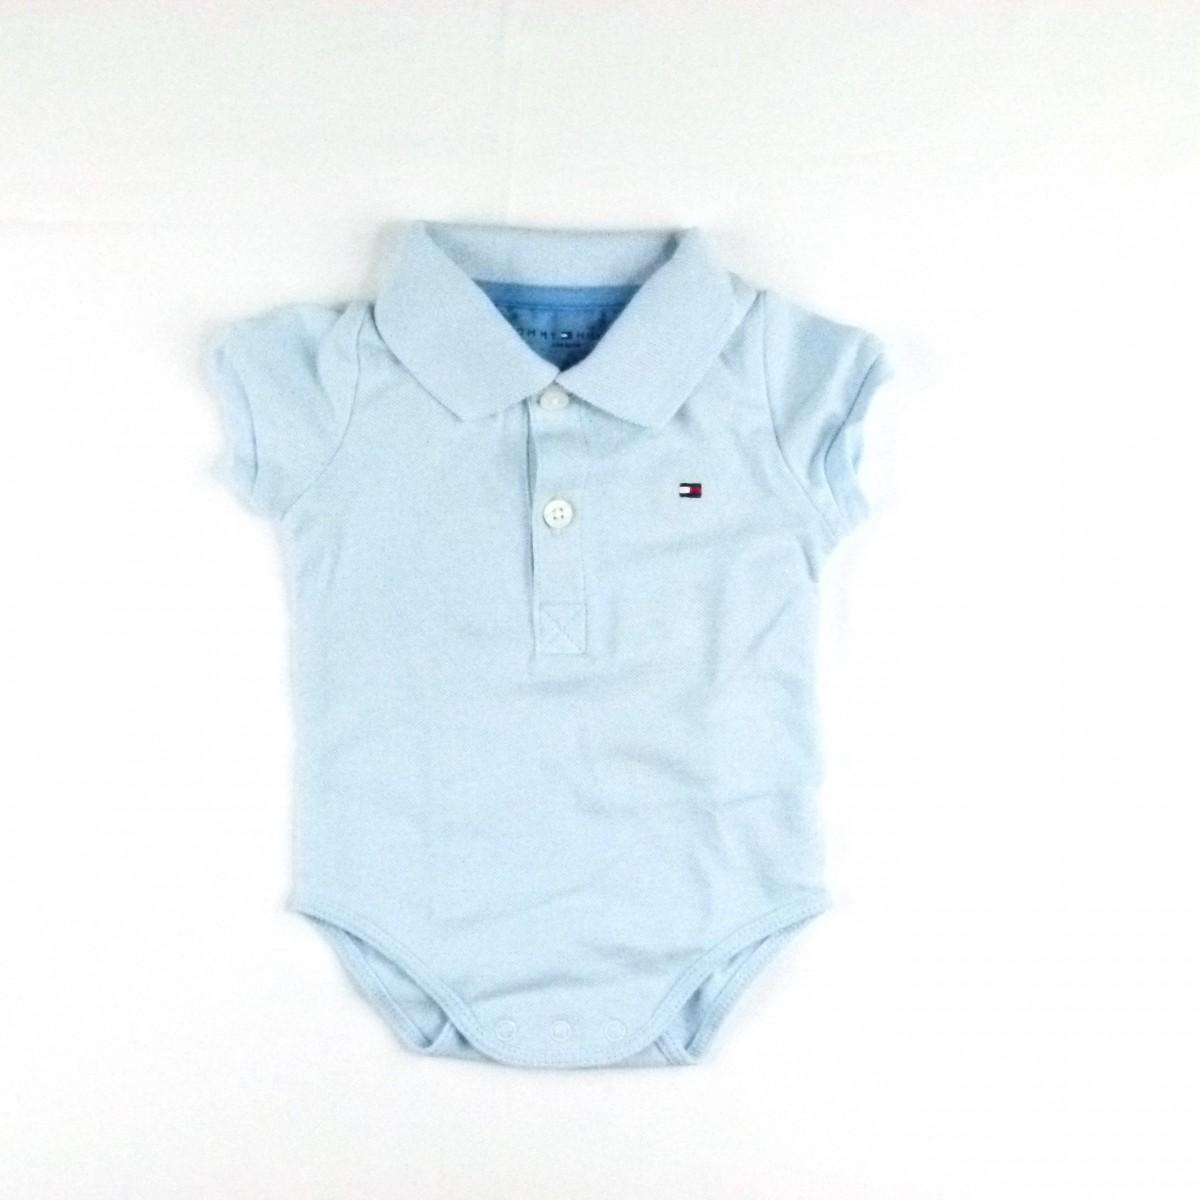 186922b5b Body Baby Basic Polo Tommy Hilfiger - 033890 Azul | Tutu Lelê.